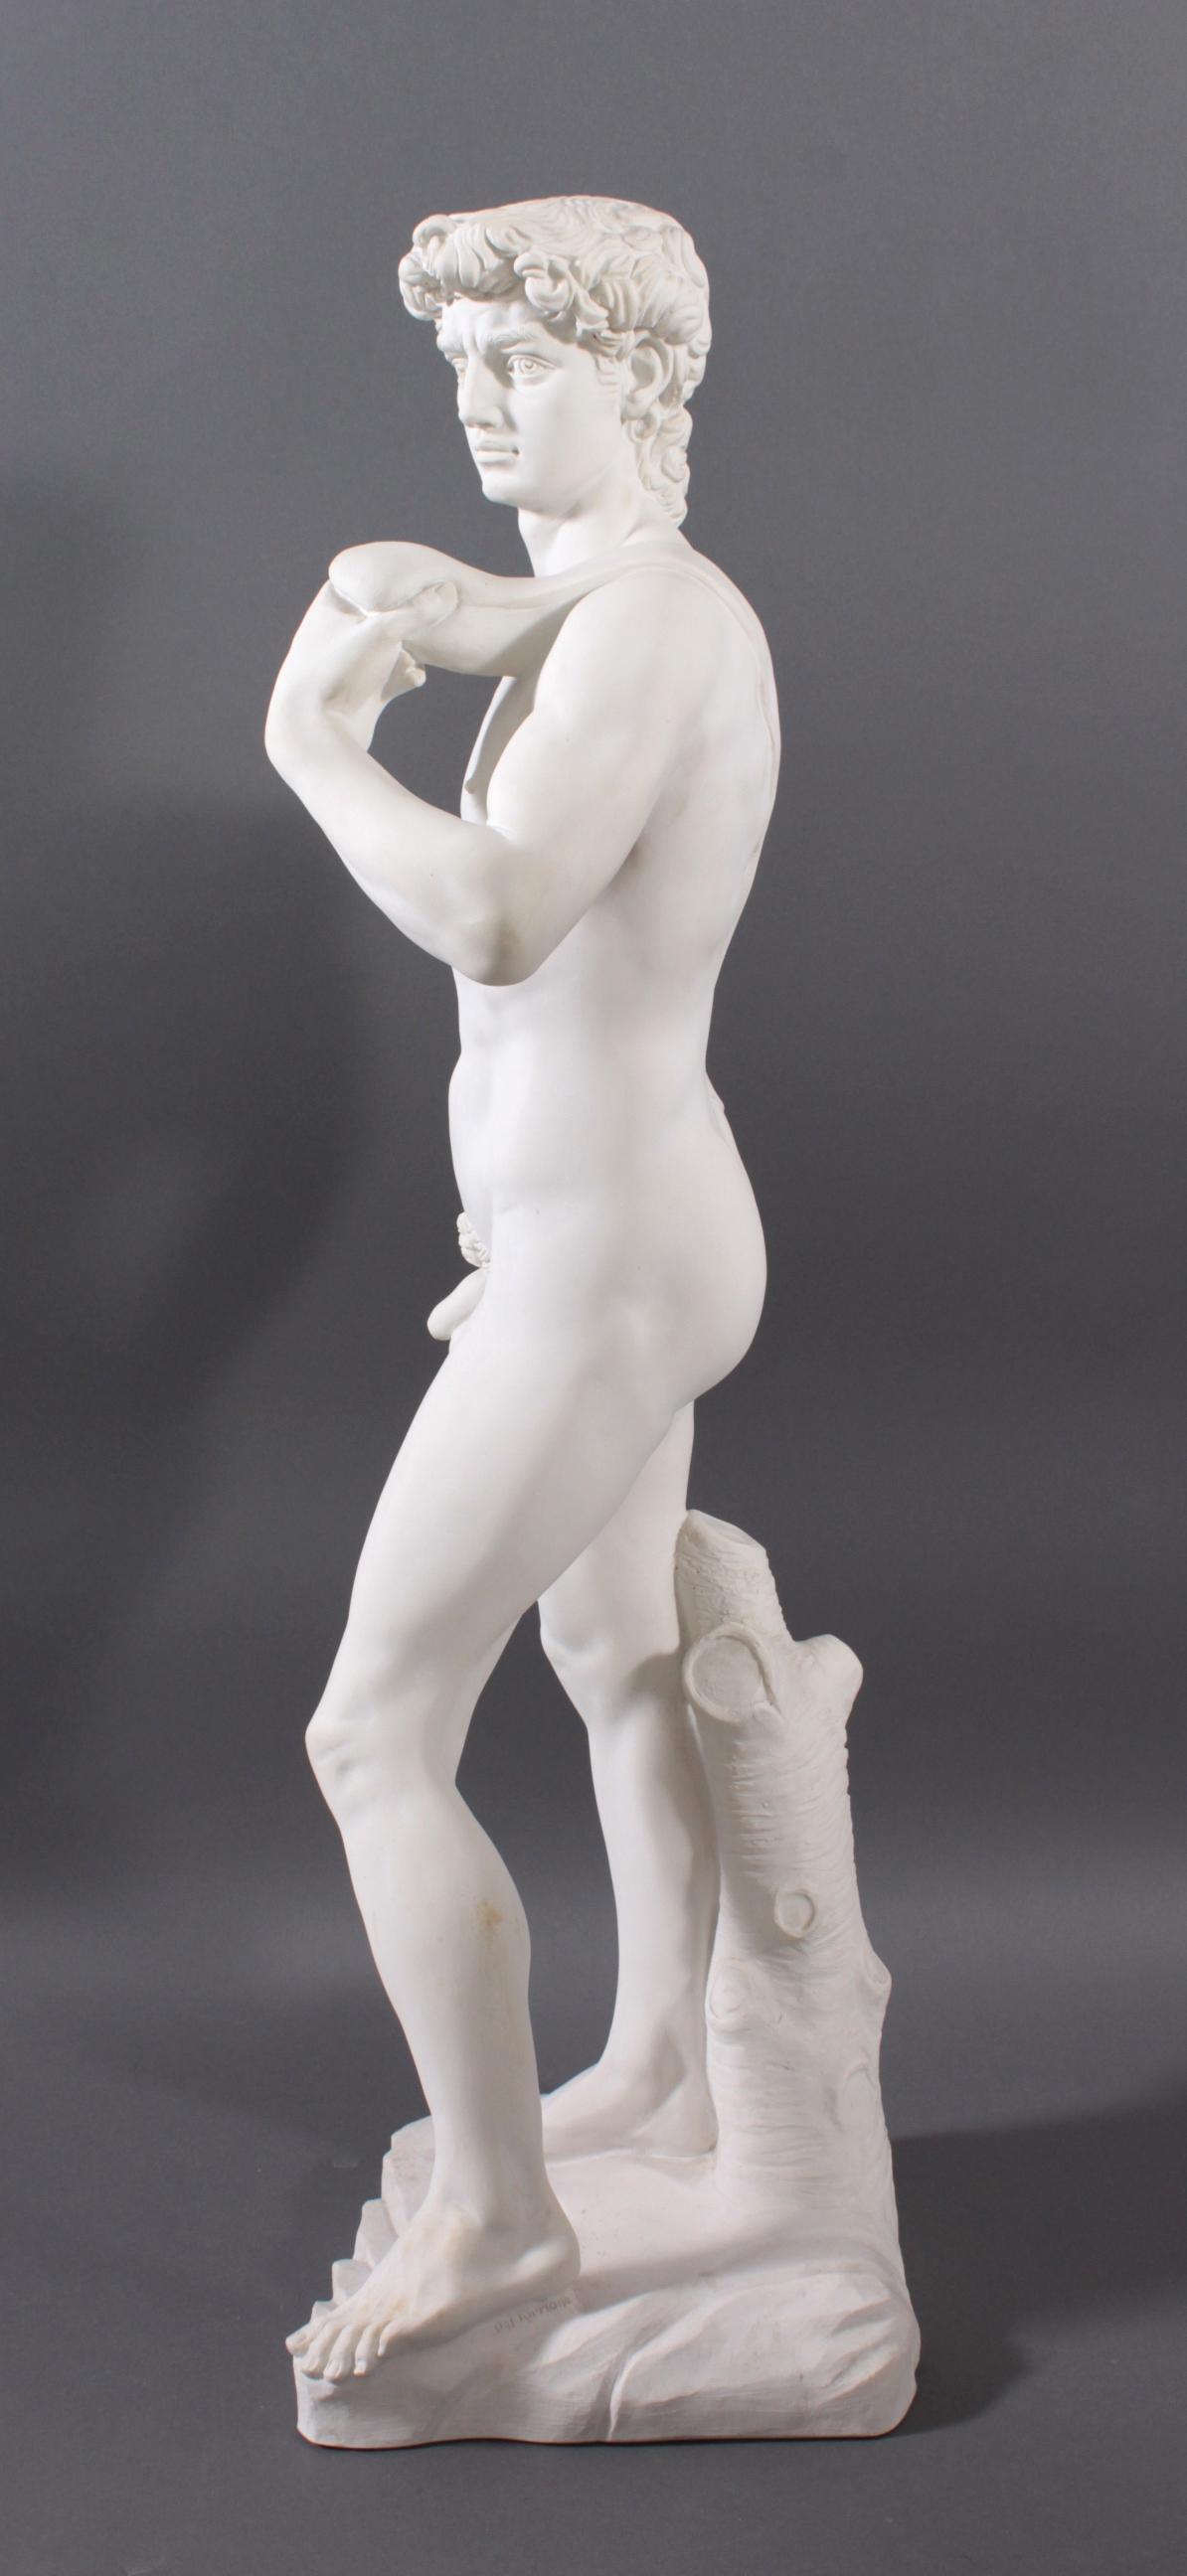 Kunstmarmor-Skulptur, 'David'-6